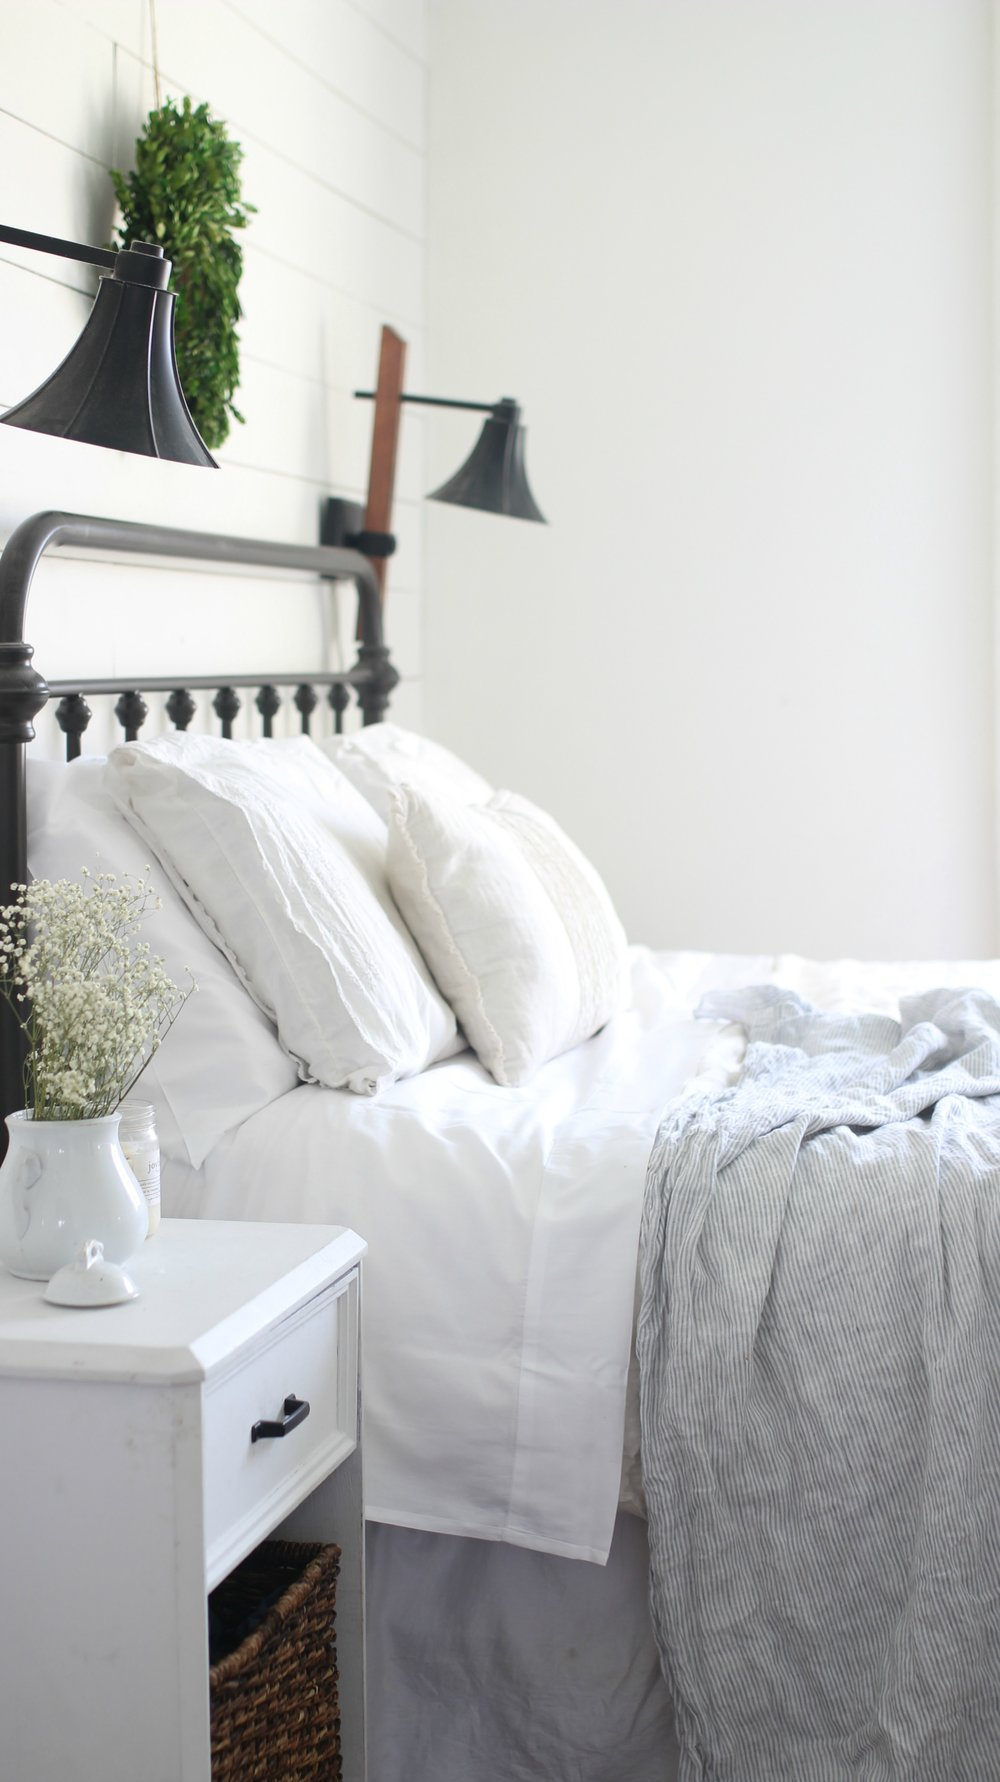 Organic white cotton sheets from Jefferson Lane